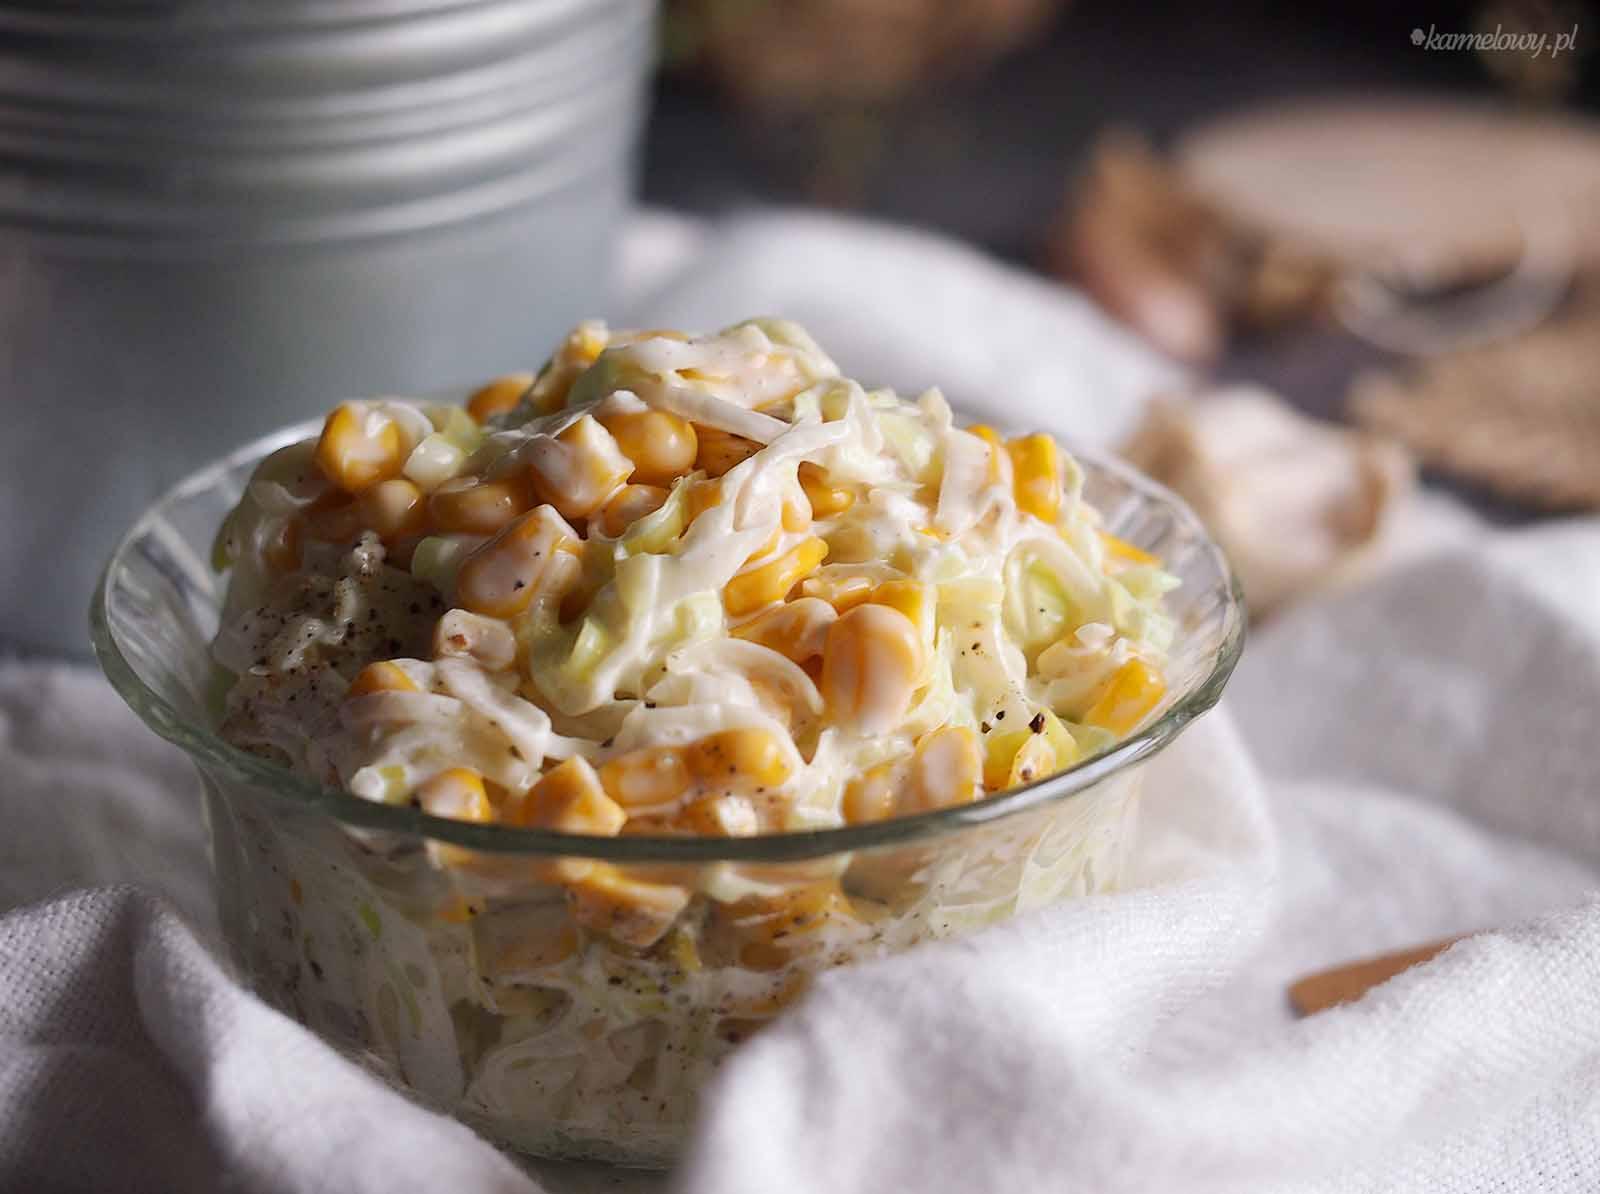 Surowka-z-pora-z-kukurydza-Leek-and-corn-salad